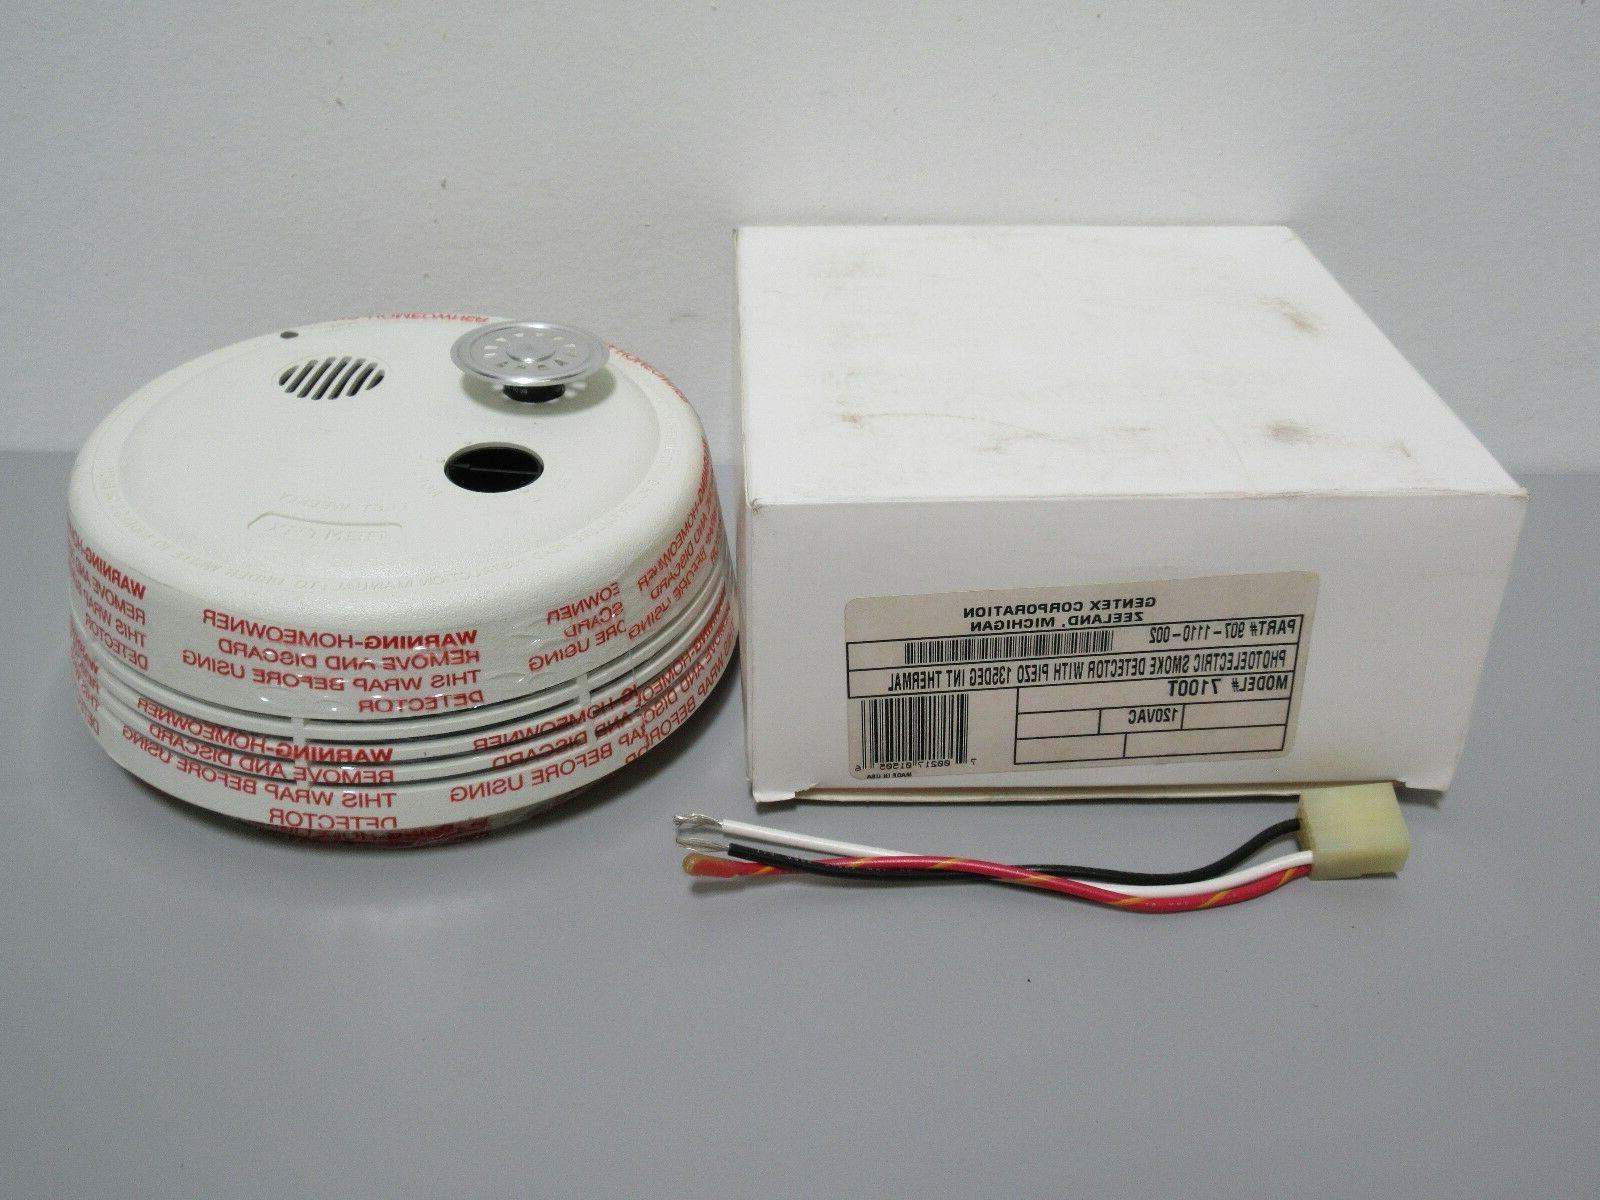 7100t smoke alarm